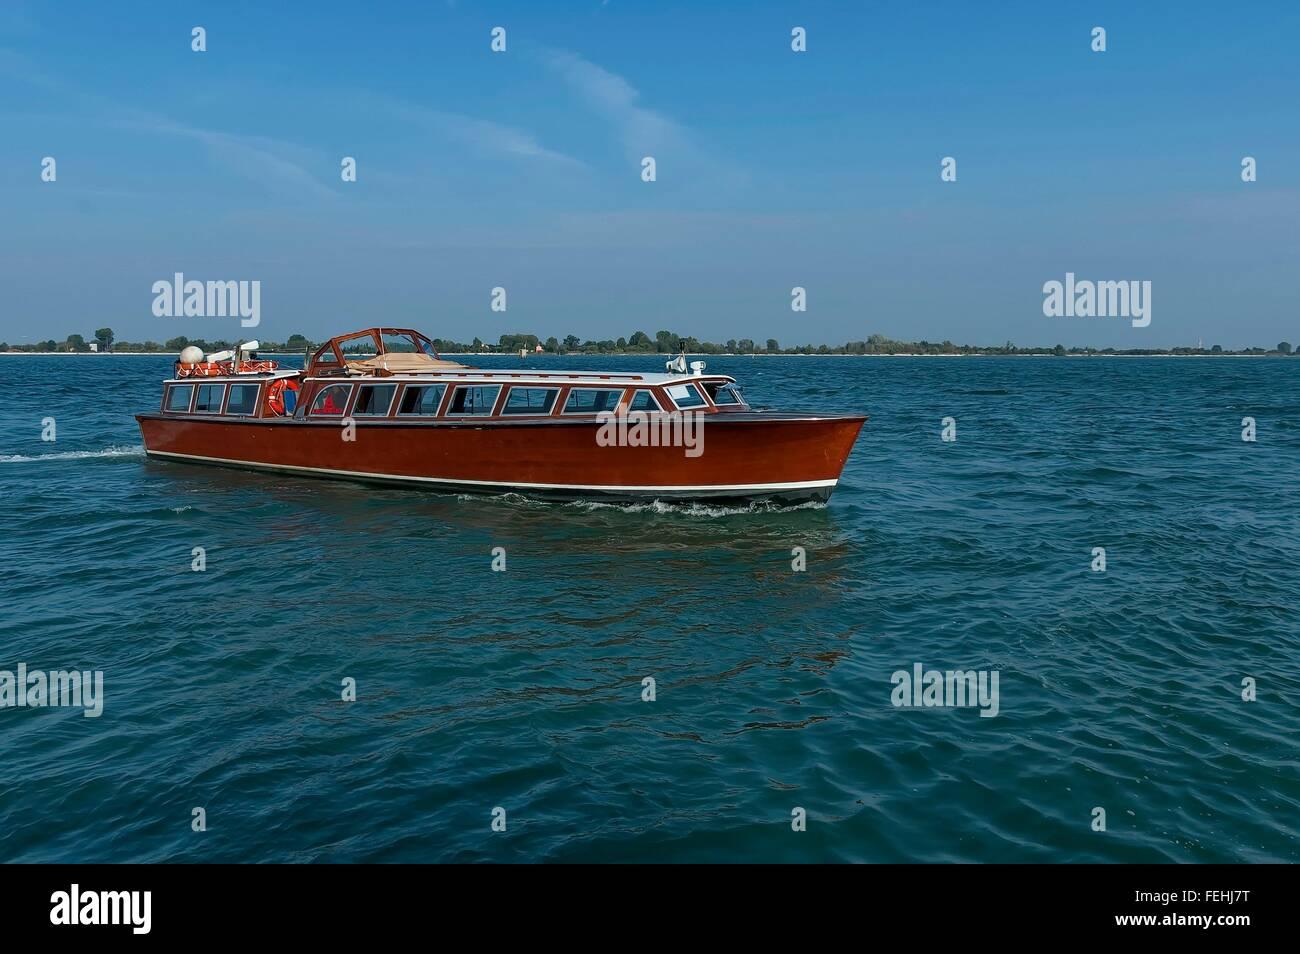 Cruise Ship In The Adriatic Sea Near Venice Italy Europe